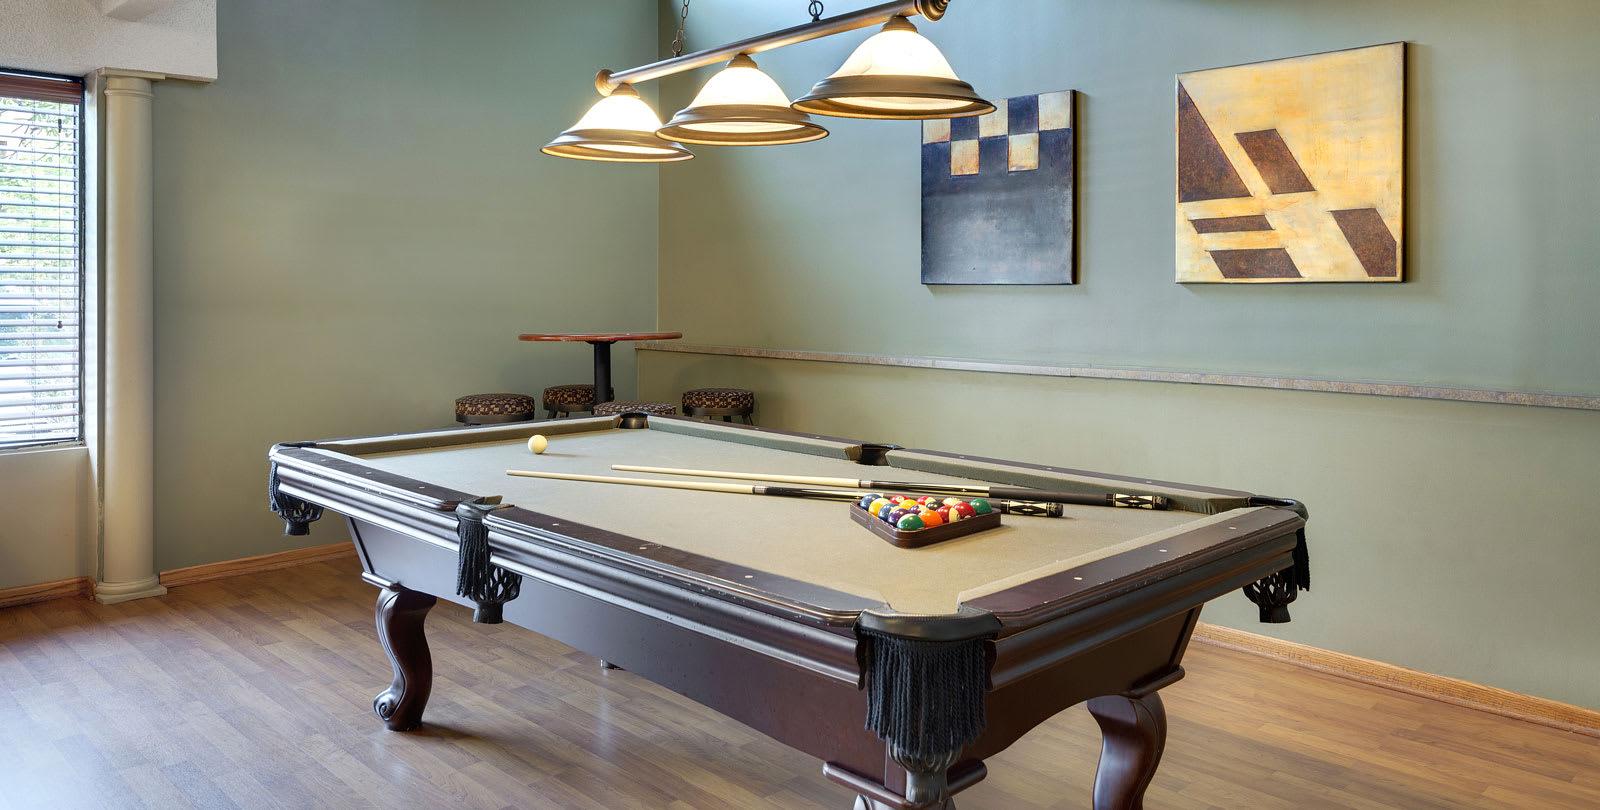 Park Pointe Apartments in St. Louis Park, MN Billiards Table